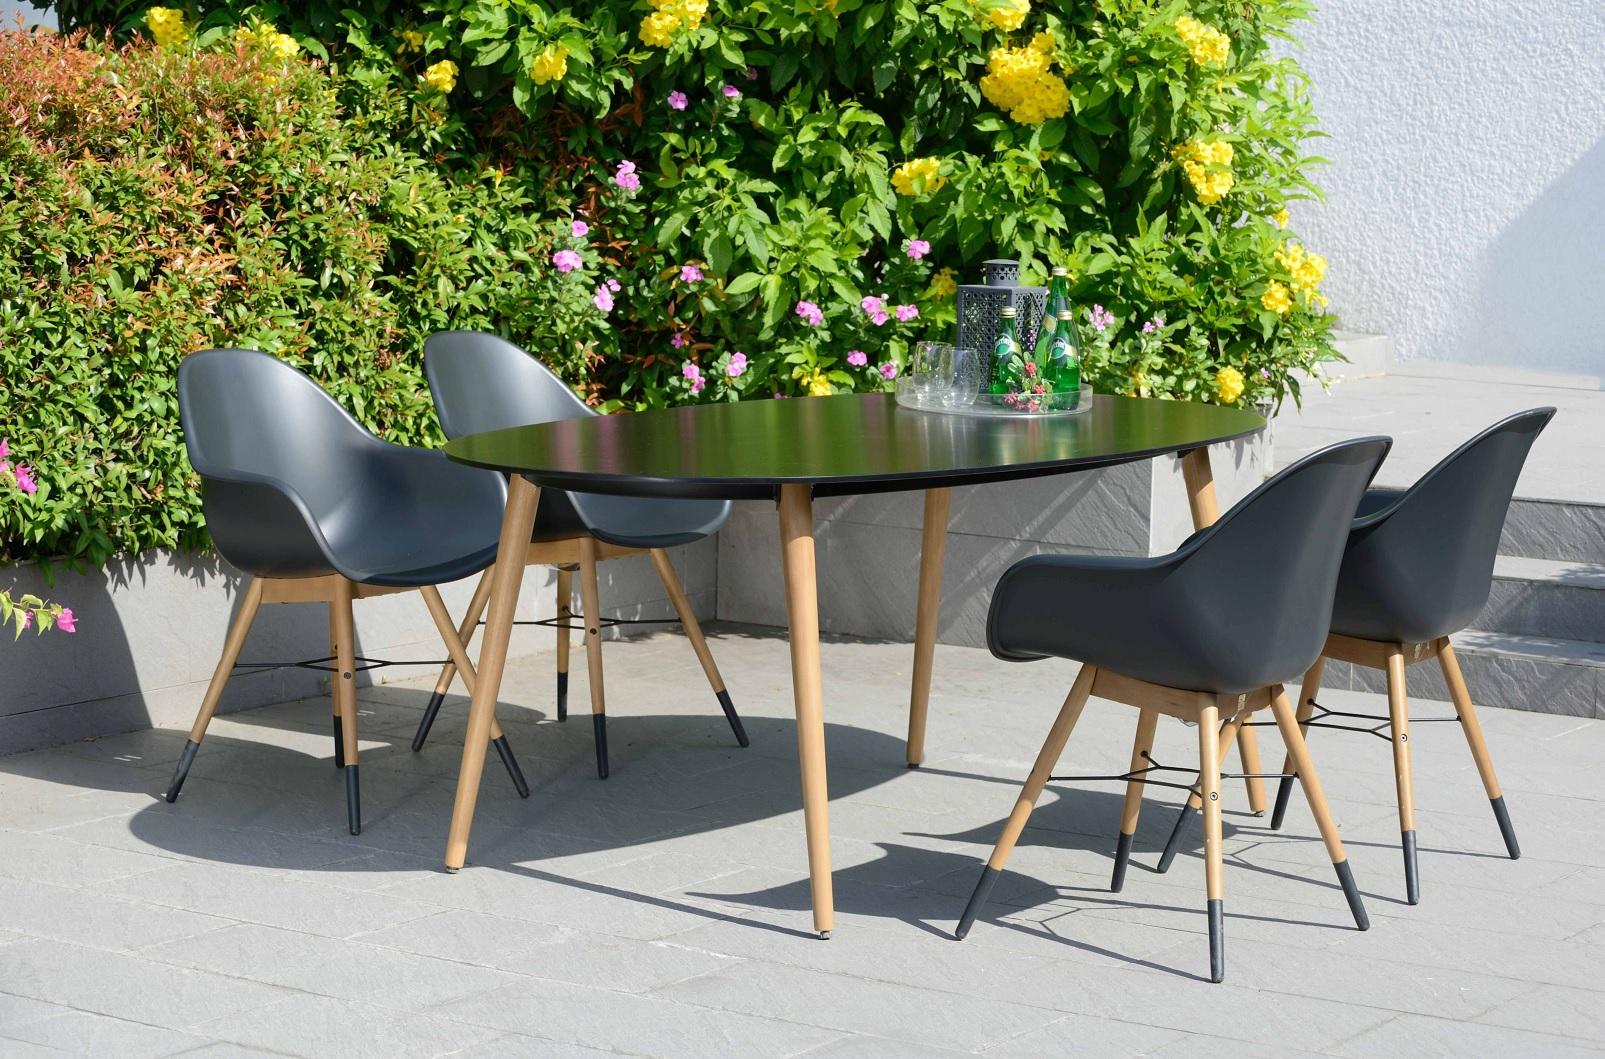 Chamonix matgrupp Bord + 4 st svarta stolar 5990 kr Trendrum se